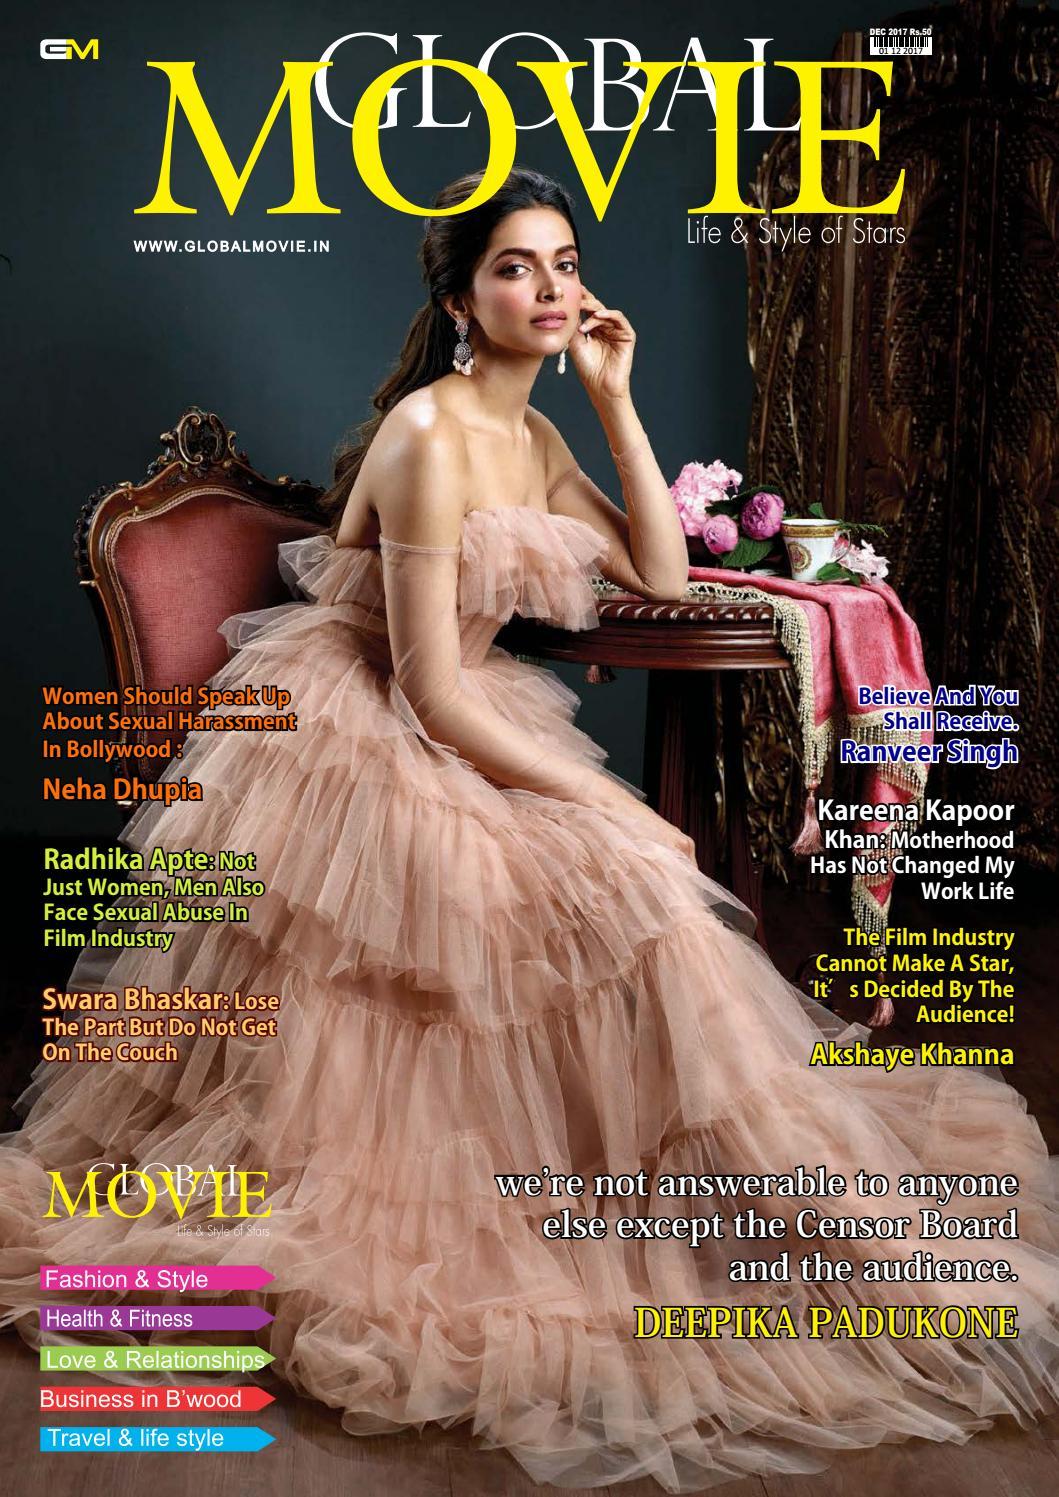 Global movie magazine dec 17 by Seema Pimpley - issuu